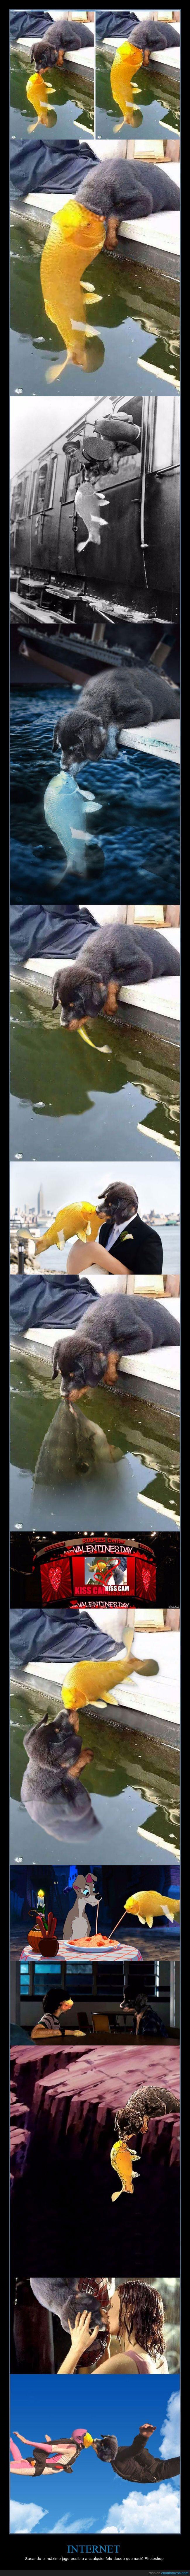 chops,montajes,perro,pez,photoshop